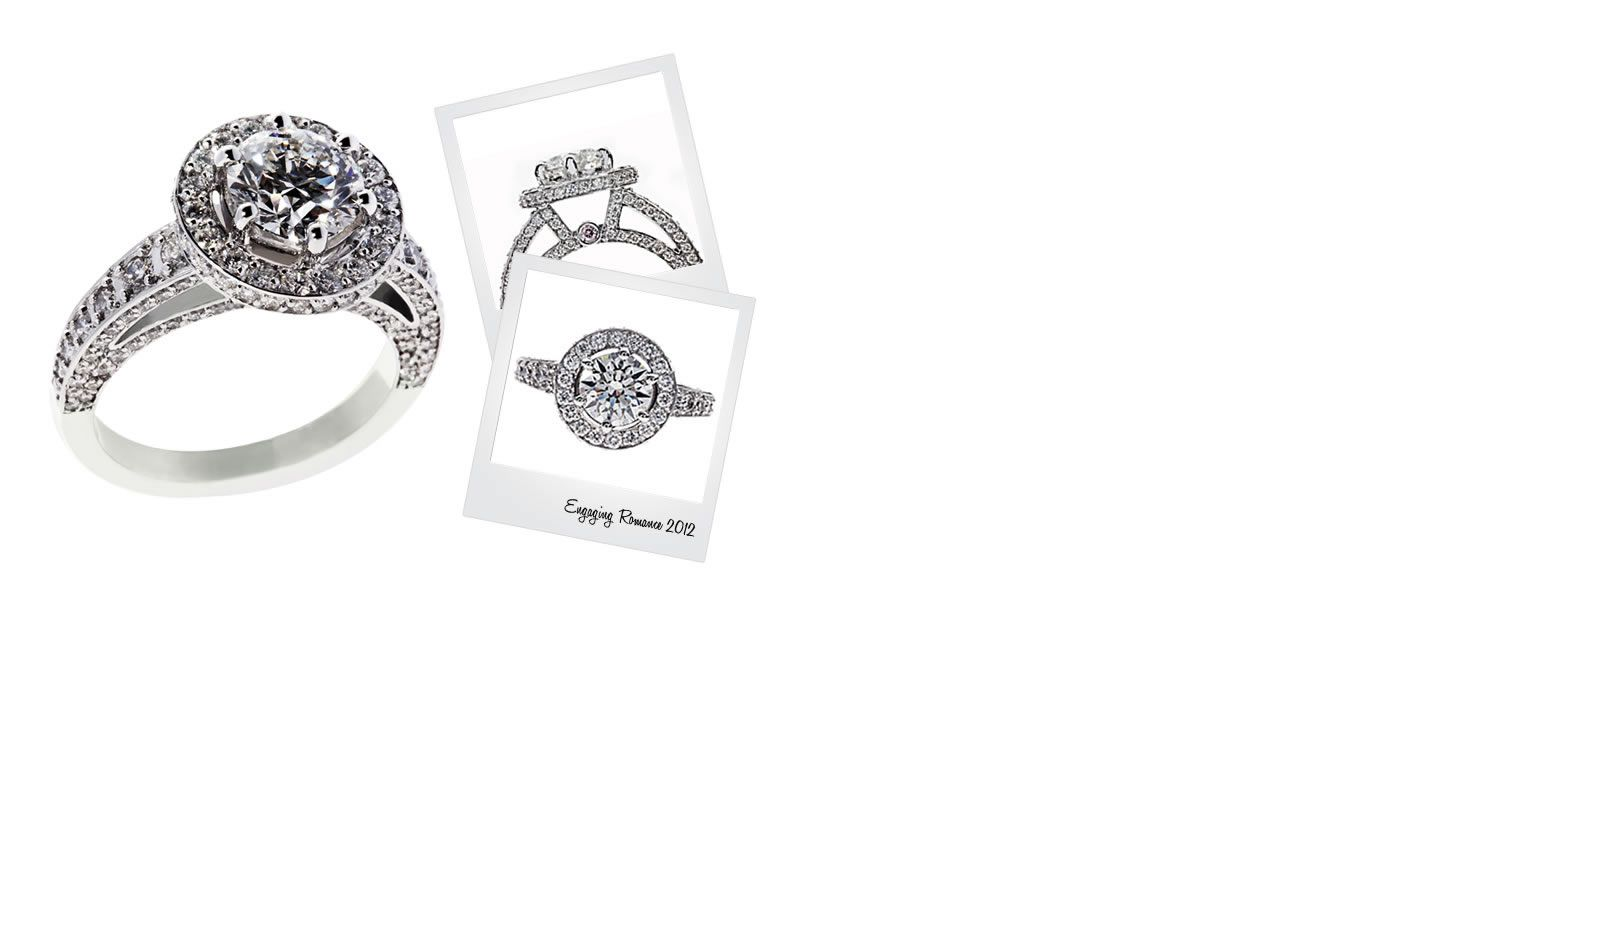 White Gold Diamond Rings, Diamond Rings, Engaging Romance™ 2012